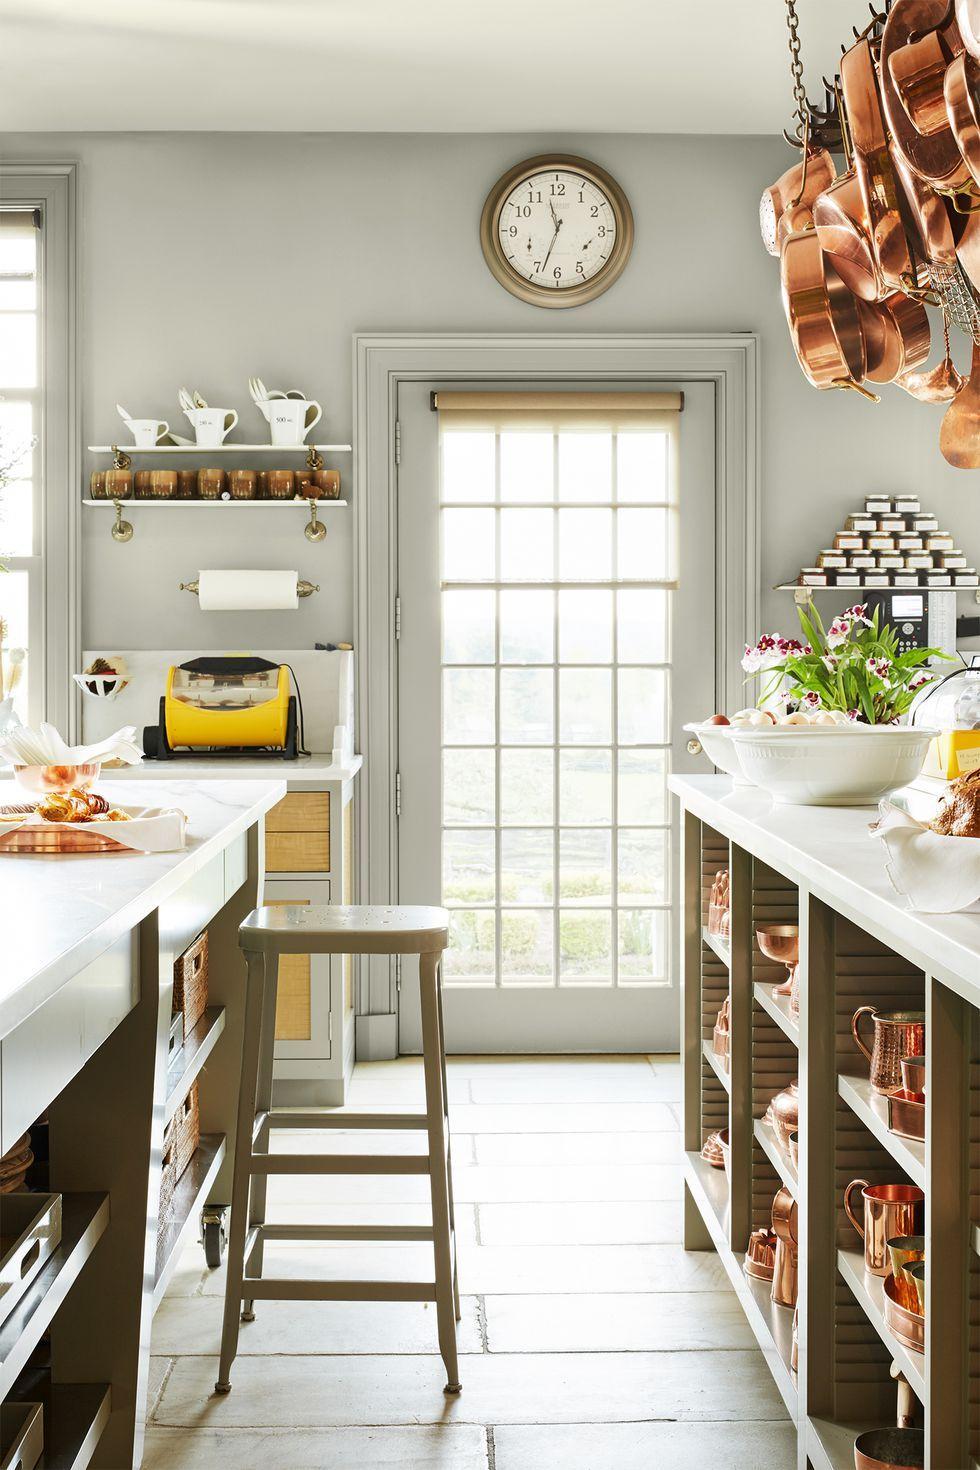 12 Best Kitchen Design Ideas - Pictures of Country Kitchen Decor